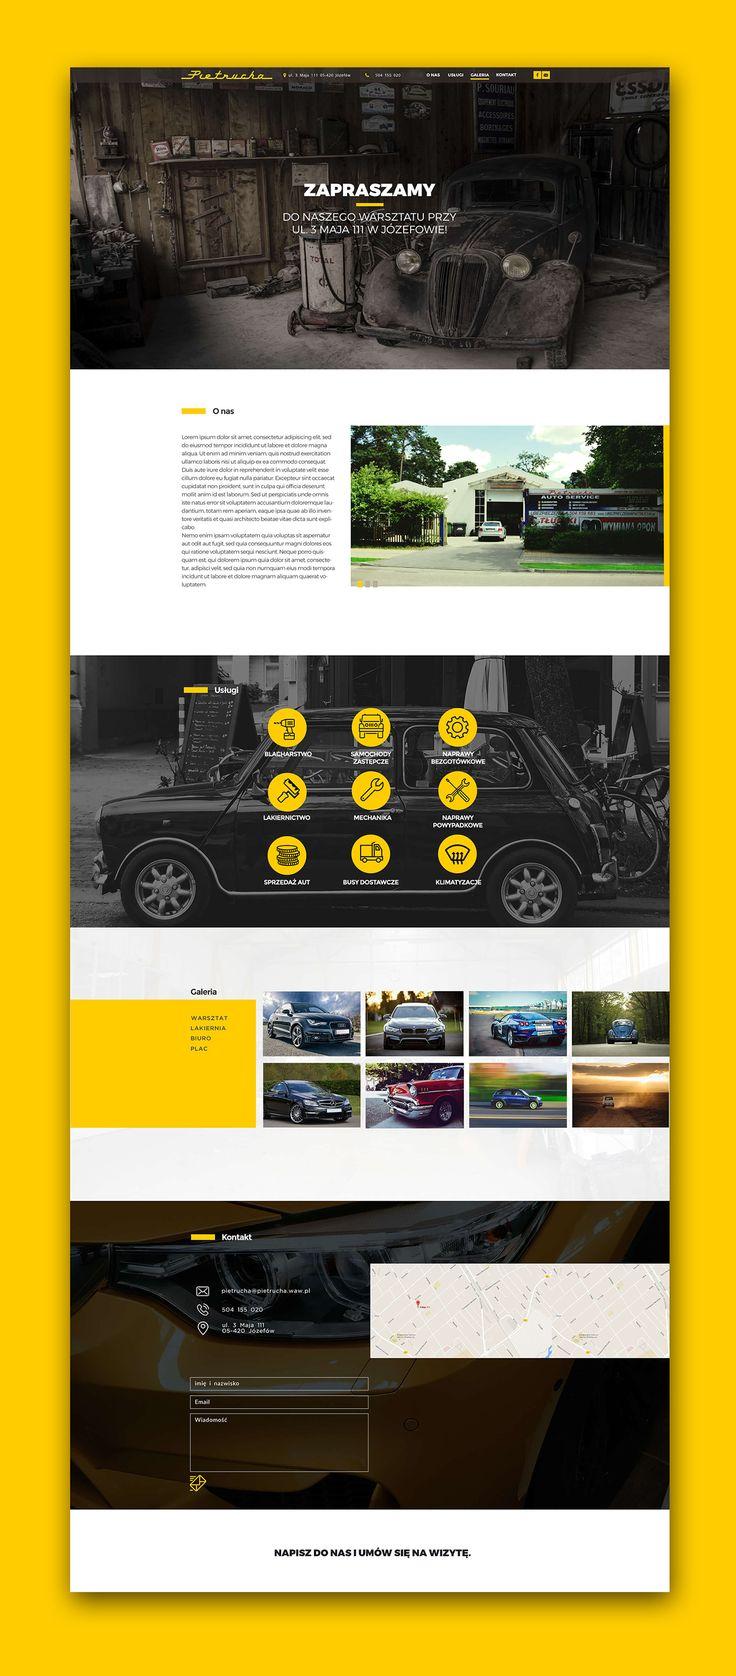 Web design inspiration UI/UX user experience fashion concept  Auto Pietrucha on Behance